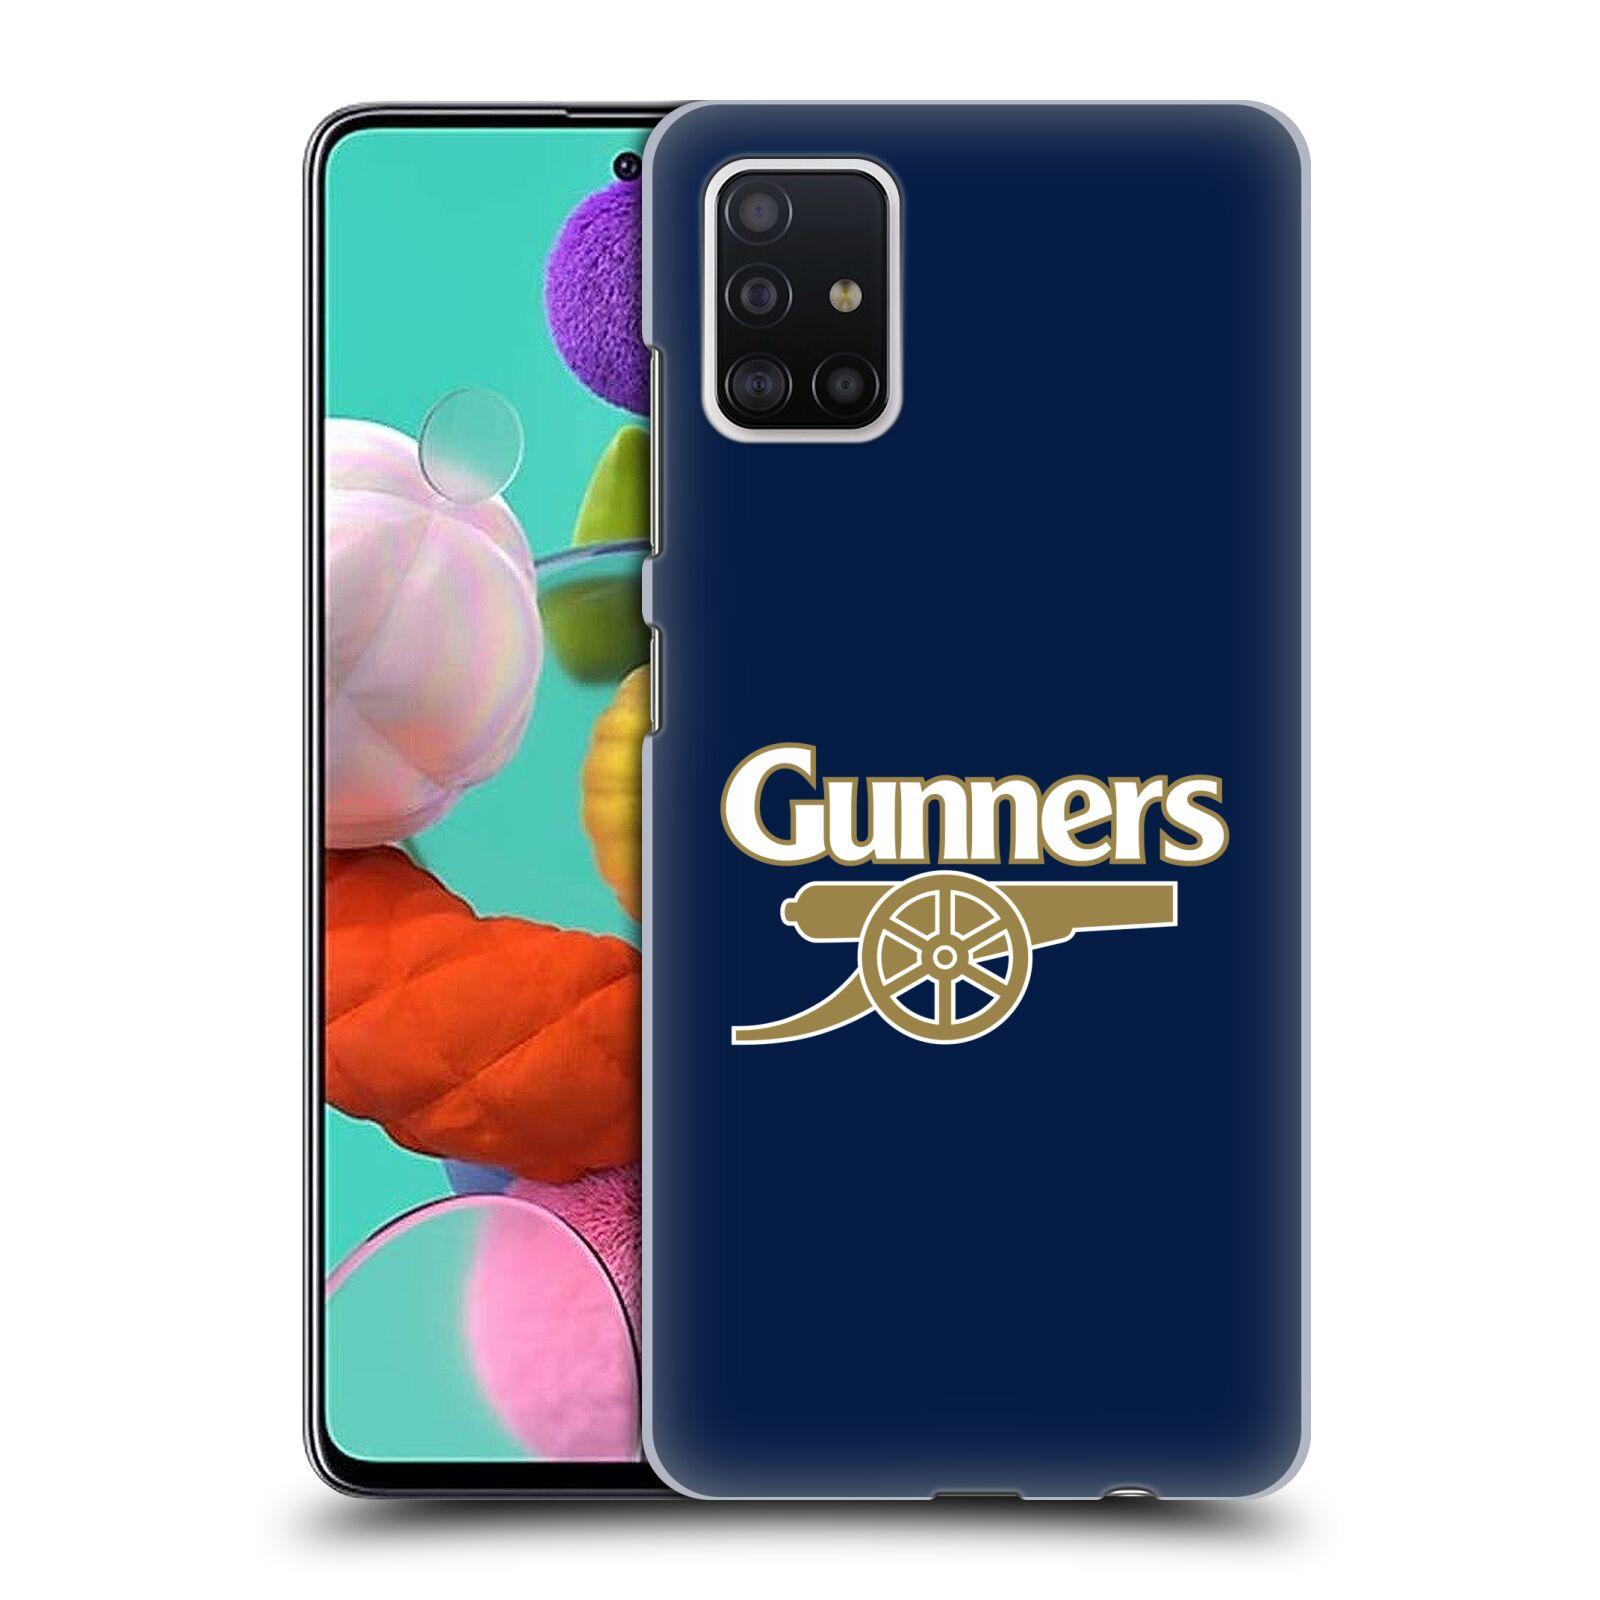 Plastové pouzdro na mobil Samsung Galaxy A51 - Head Case - Arsenal FC - Gunners